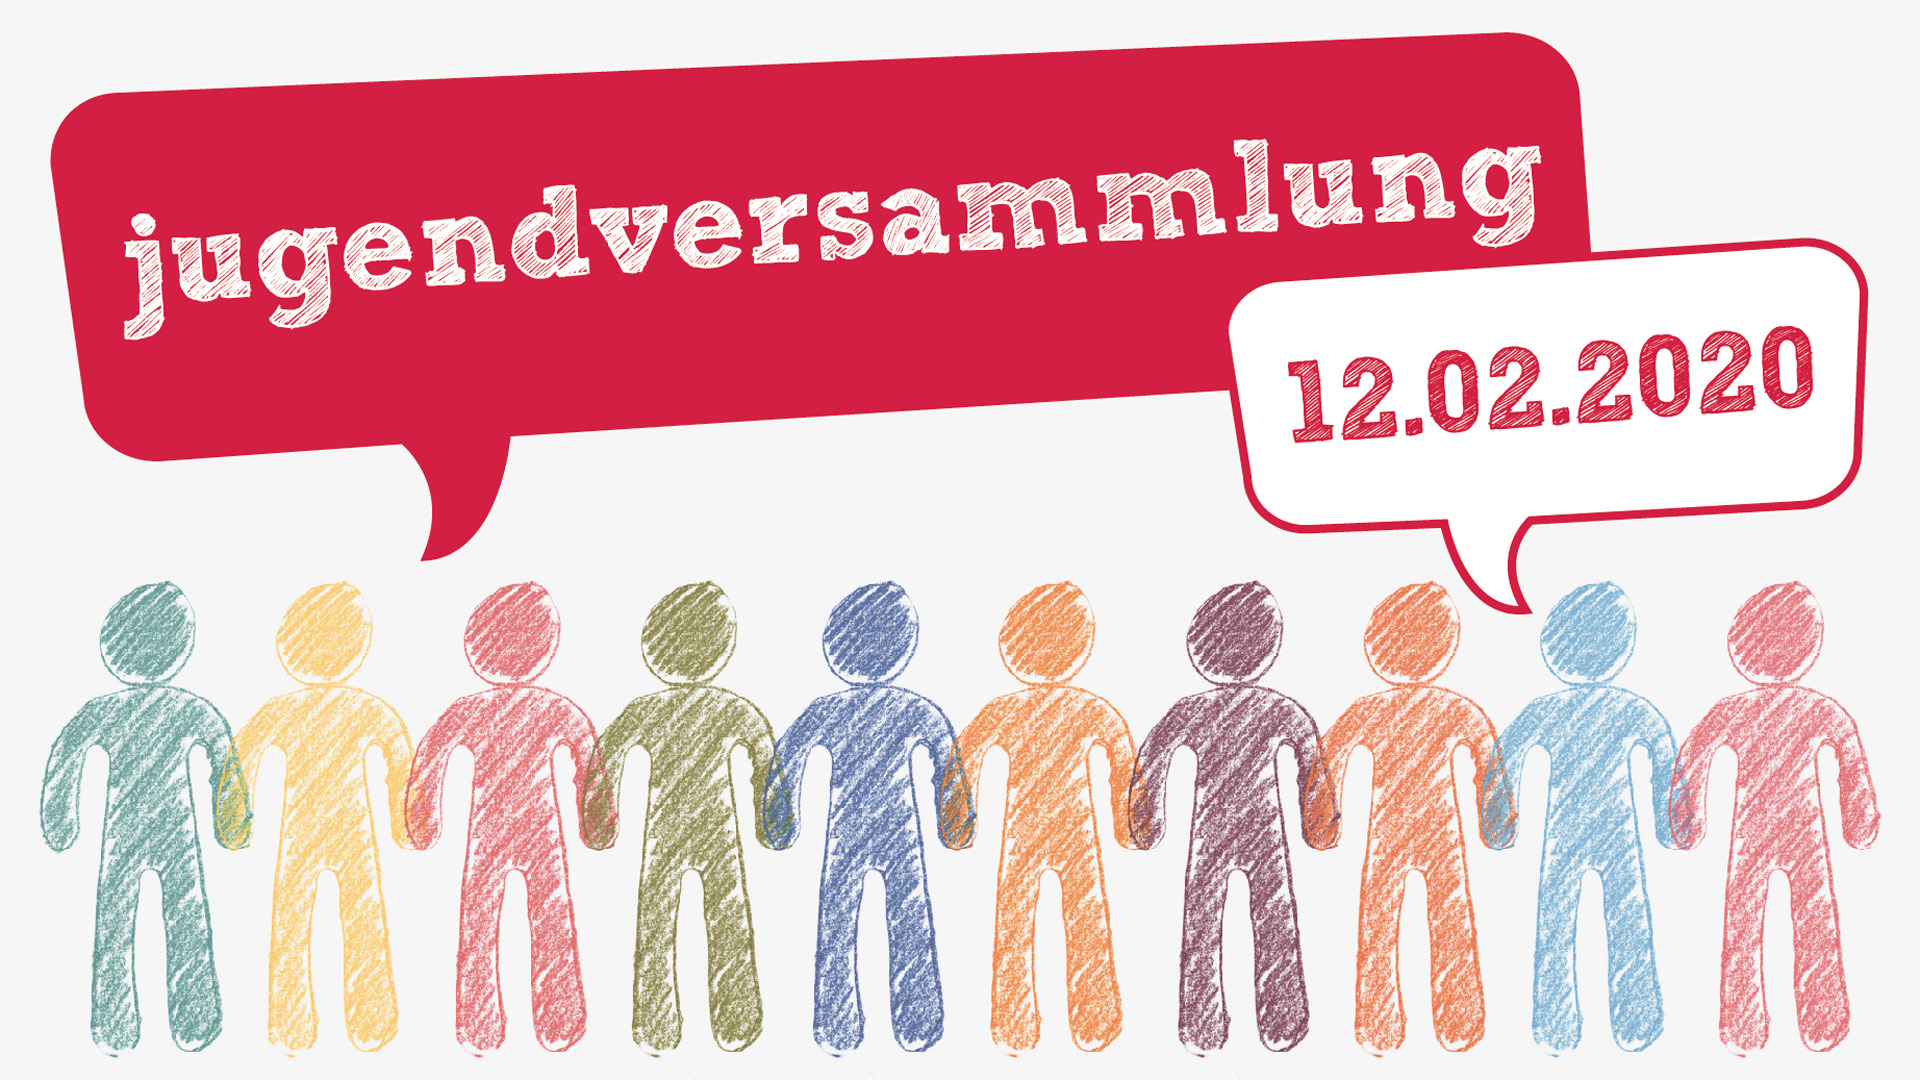 Jugendversammlung 12.02.2020